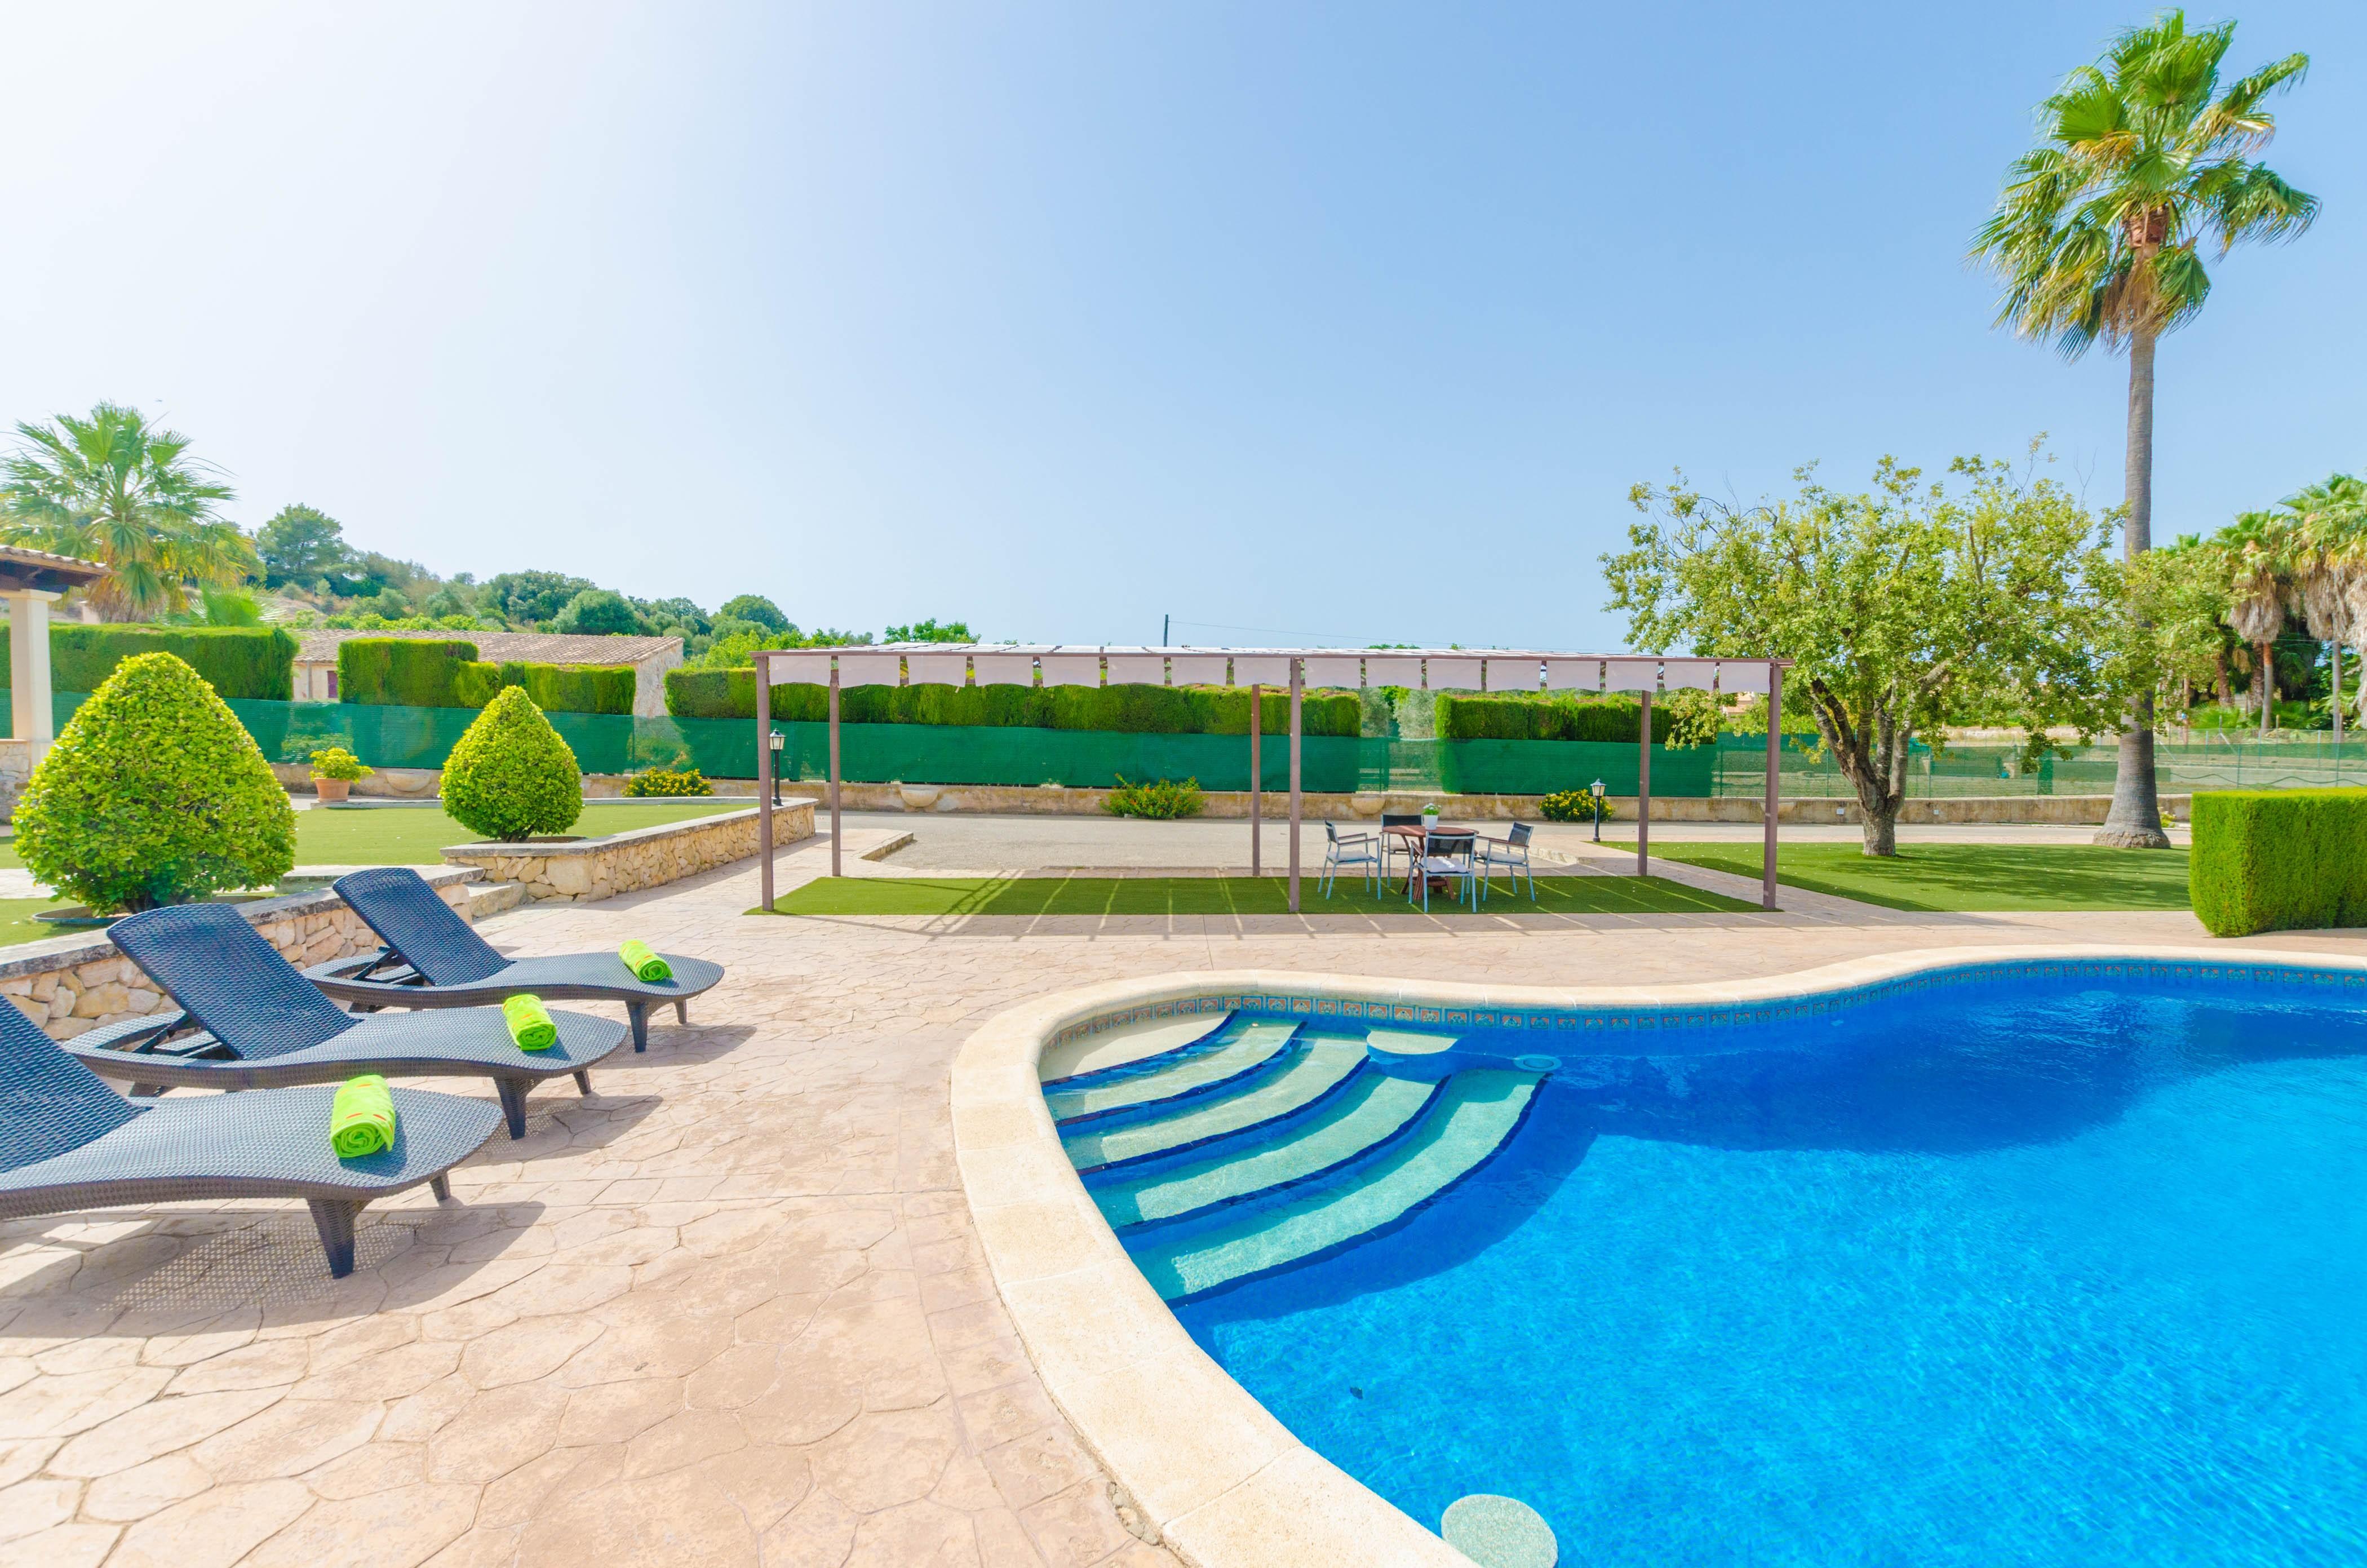 Maison de vacances SA SINIA (2374876), Lloret de Vistalegre, Majorque, Iles Baléares, Espagne, image 3